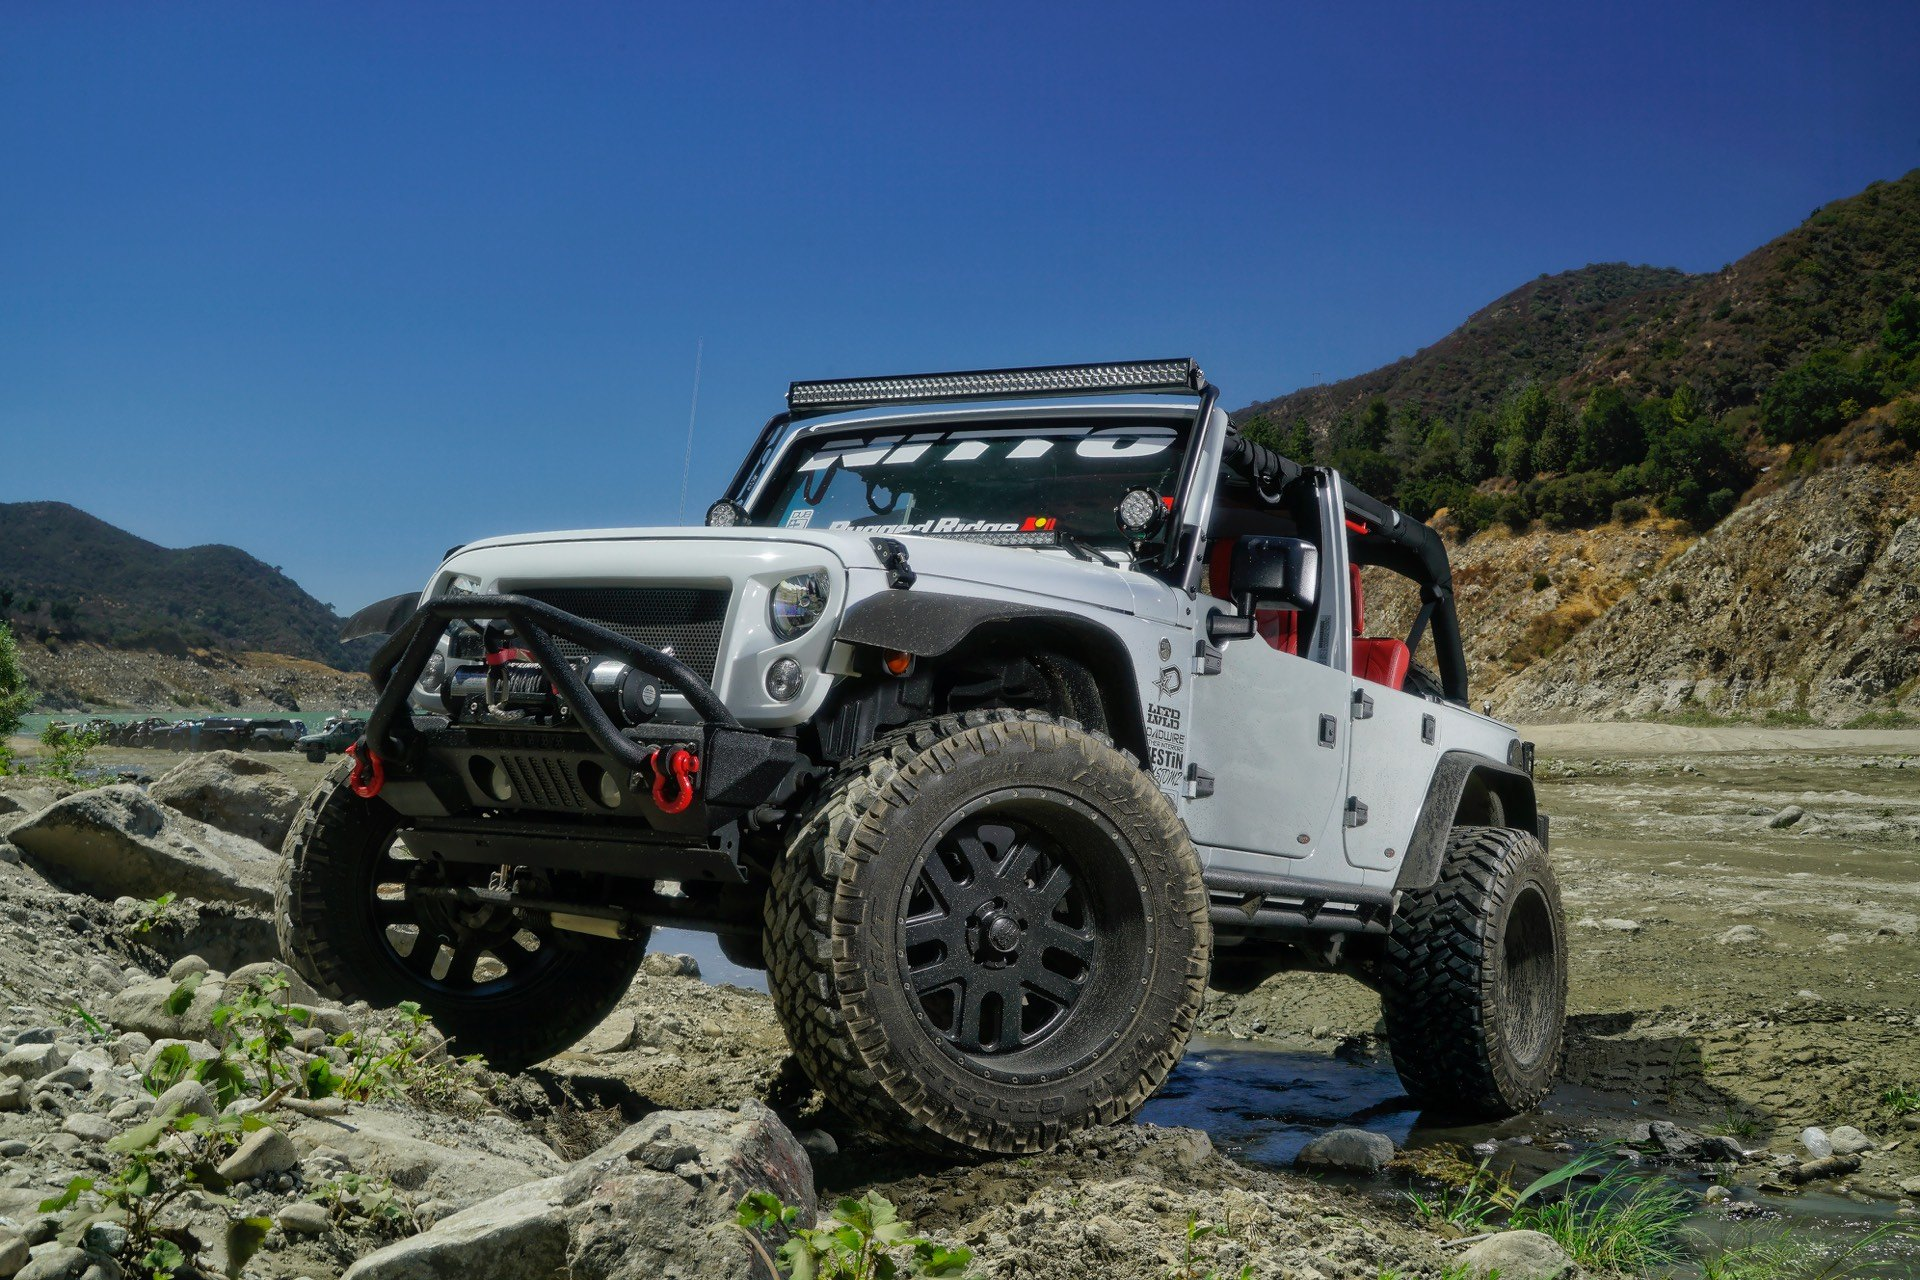 custom 2018 jeep wrangler images mods photos upgrades gallery. Black Bedroom Furniture Sets. Home Design Ideas